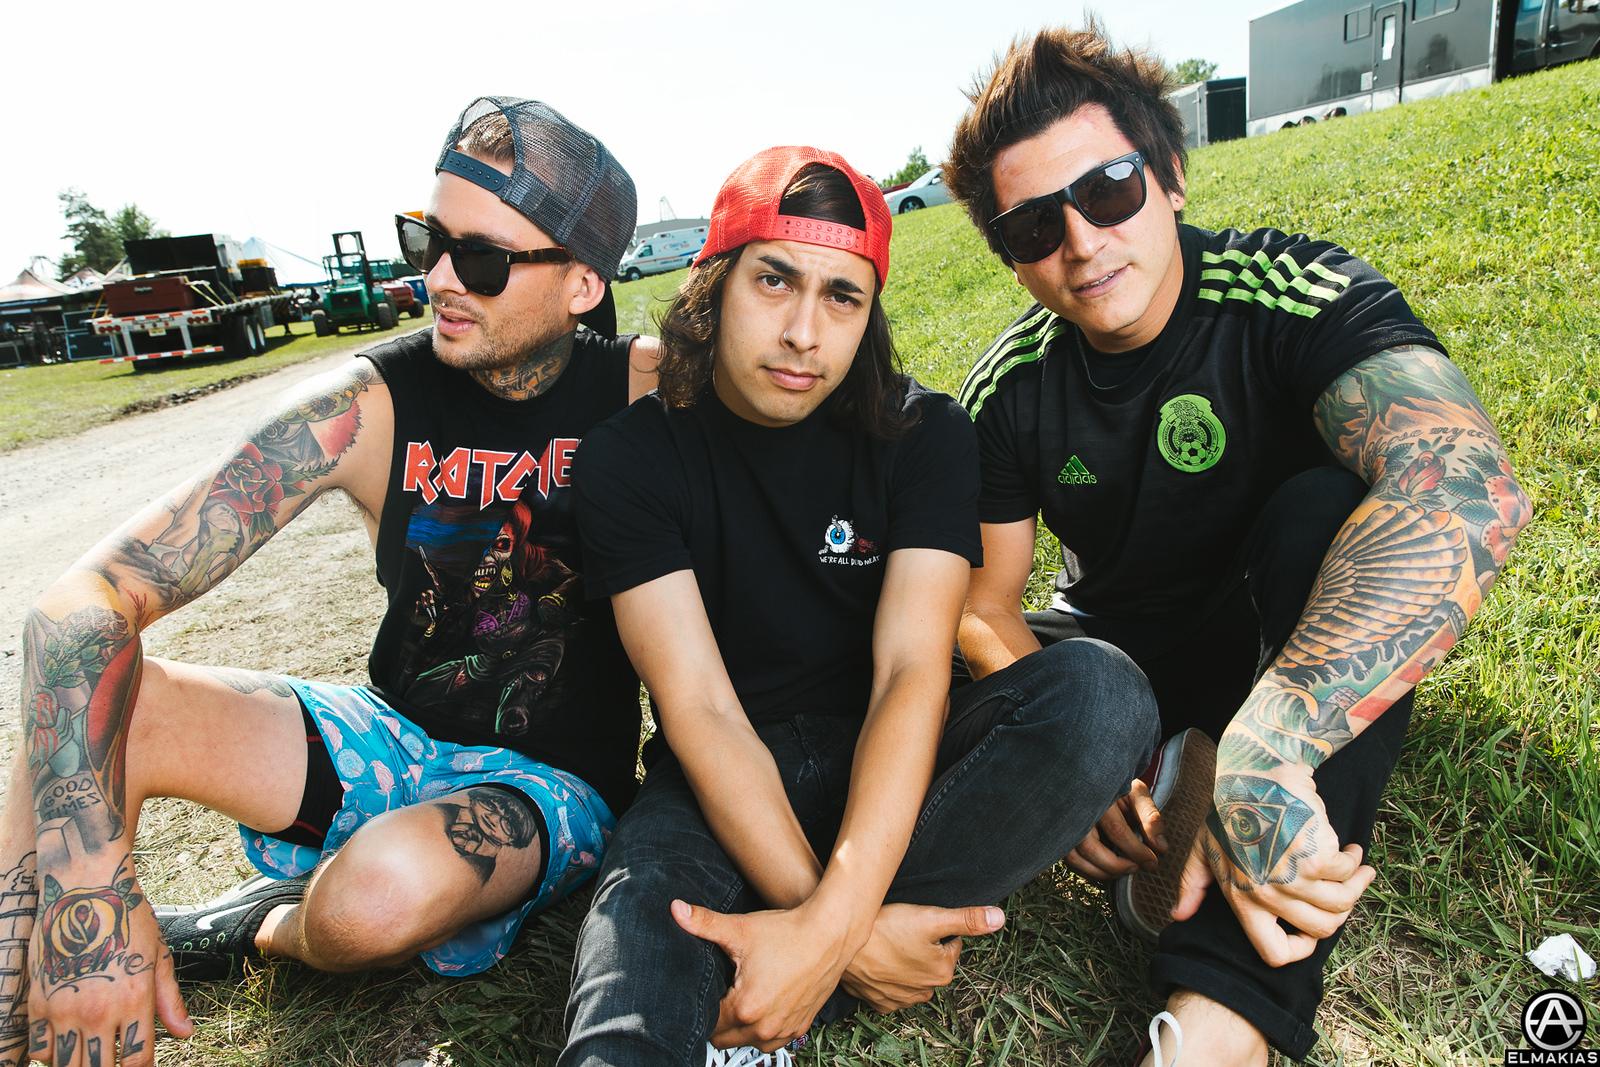 Mike Fuentes, Vic Fuentes, and Jaime Preciado of Pierce the Veil at Warped Tour 2015 by Adam Elmakias